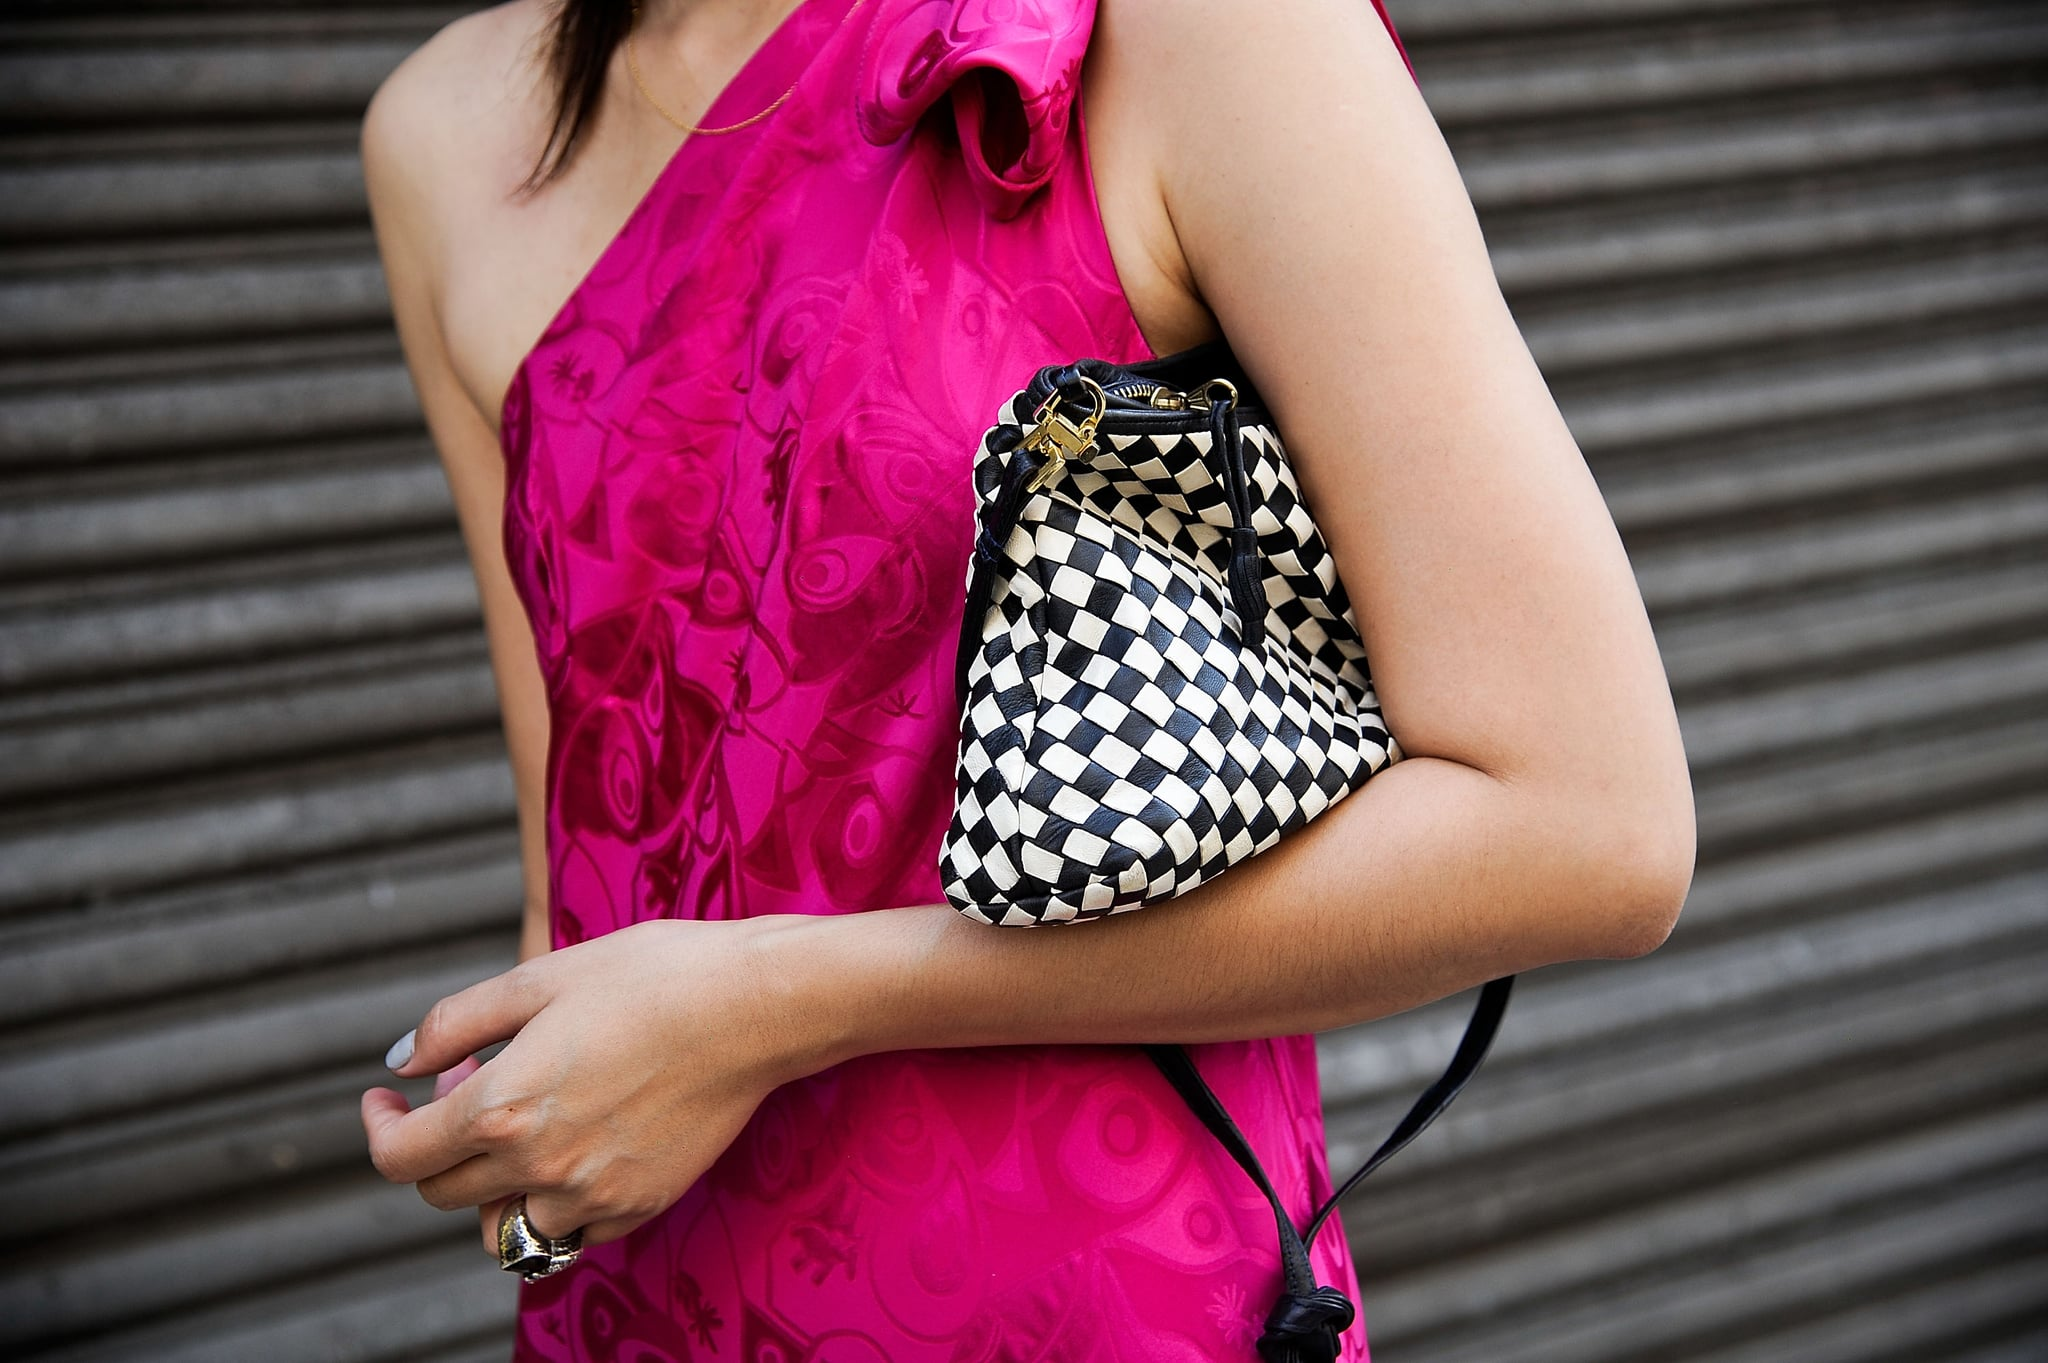 A vintage Bottega Venetta clutch popped against a pretty fuchsia dress.